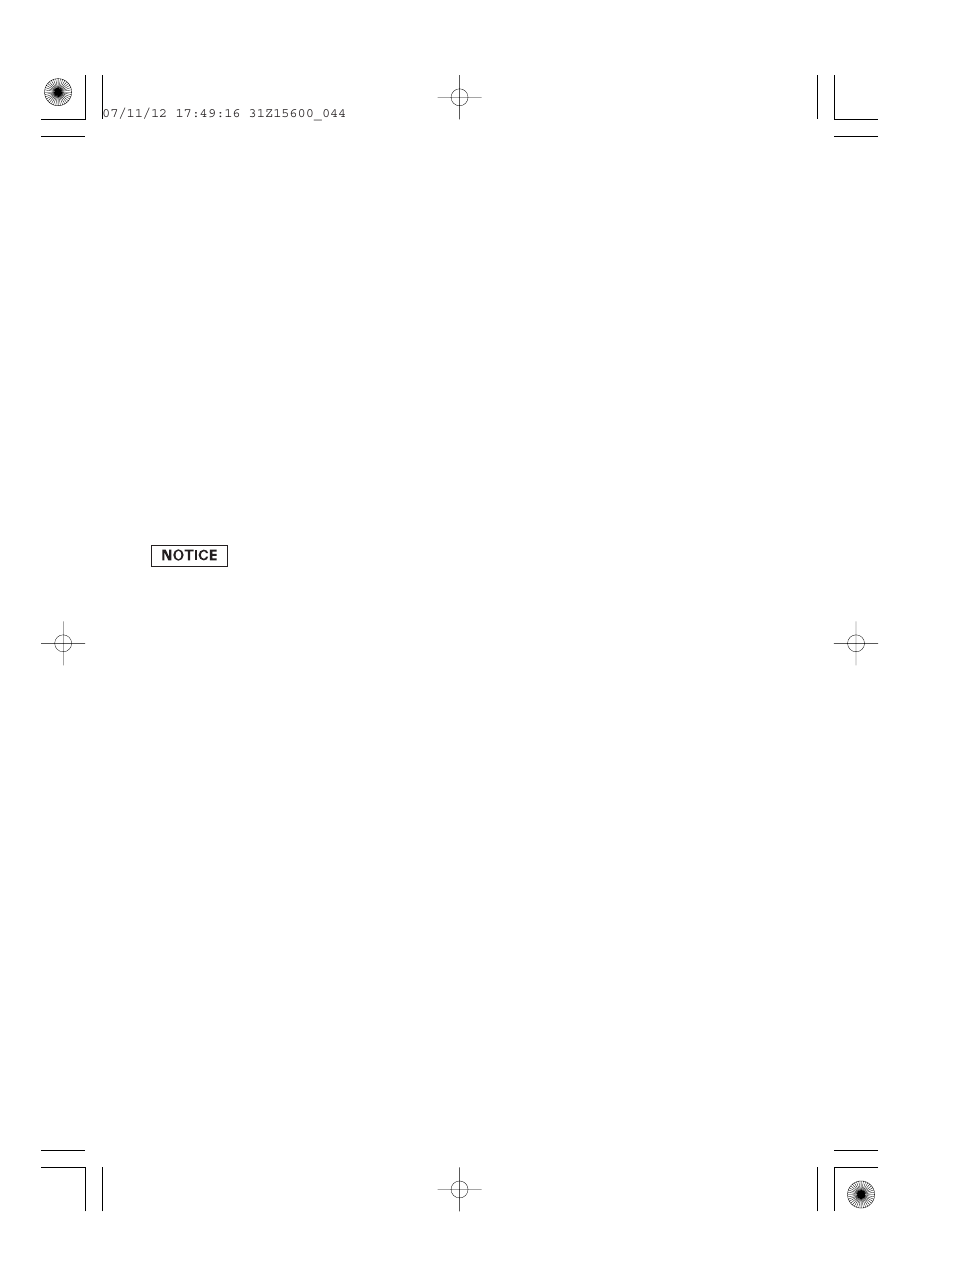 Storage, Storage preparation, Cleaning | Fuel | HONDA EP2500CX User Manual  | Page 45